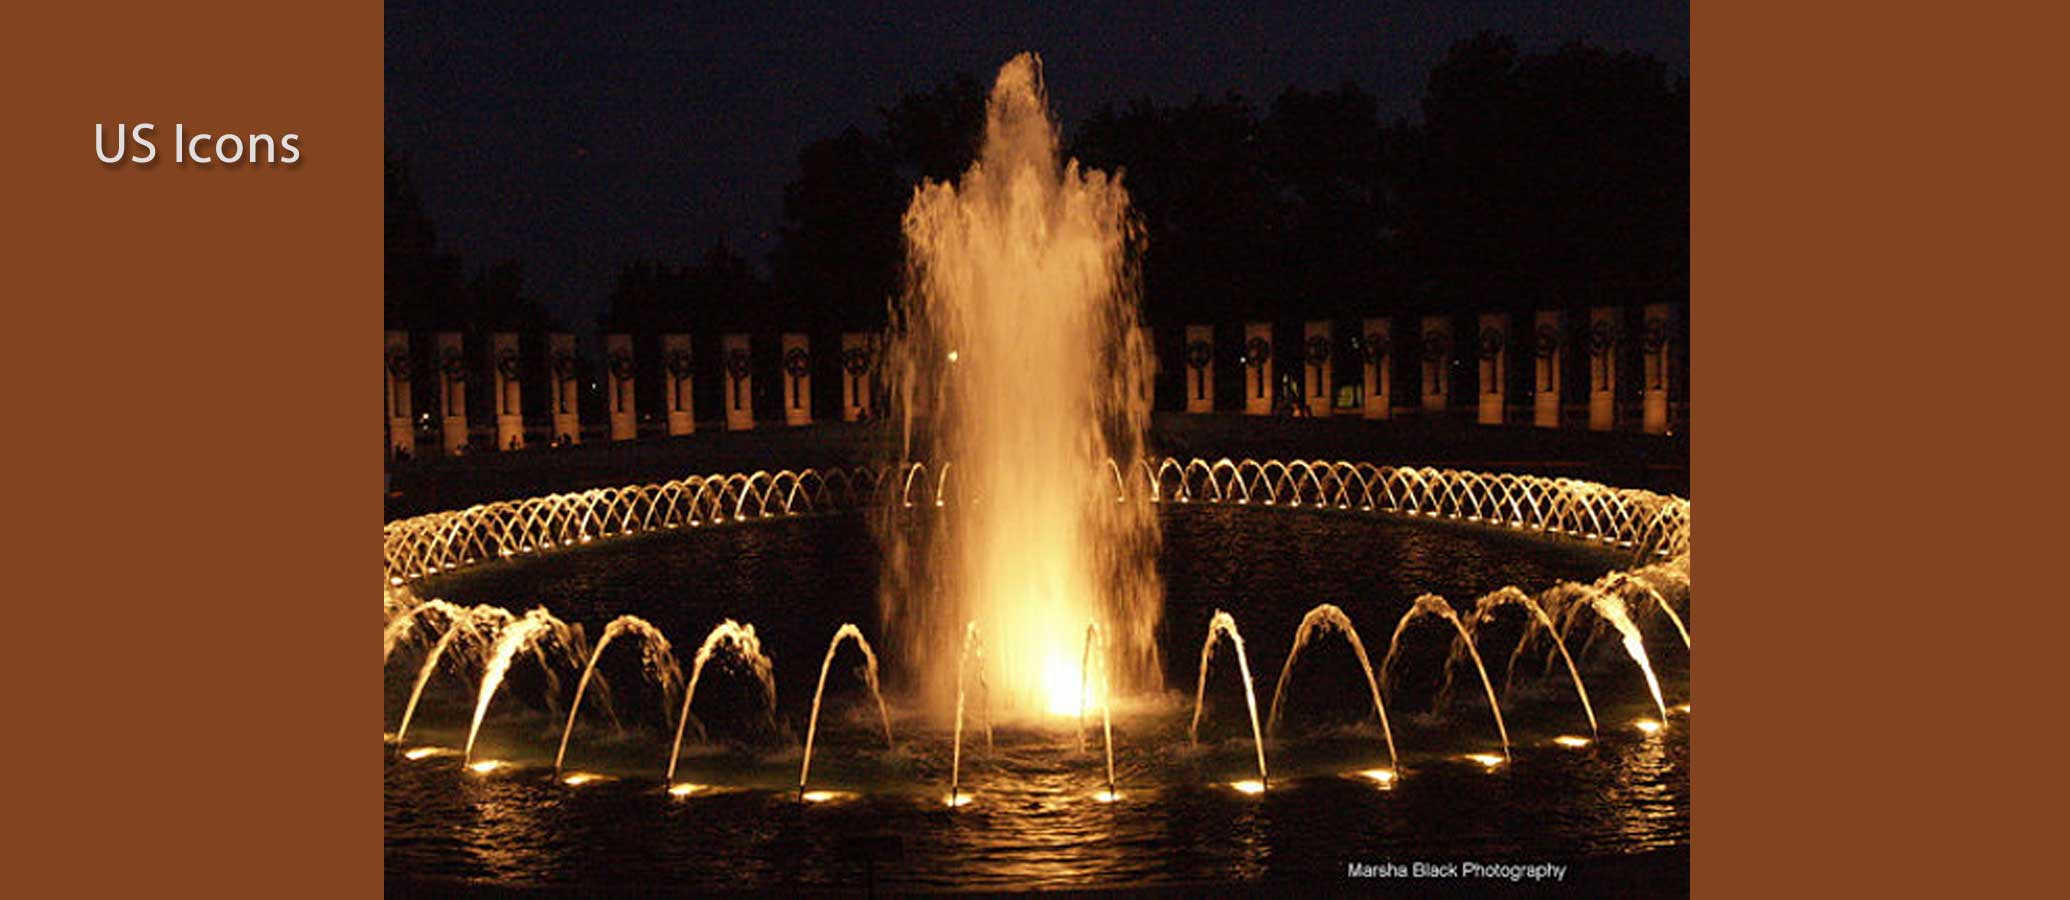 Washington, D.C.'s World War II Monument at night   Photo: Marsha J Black